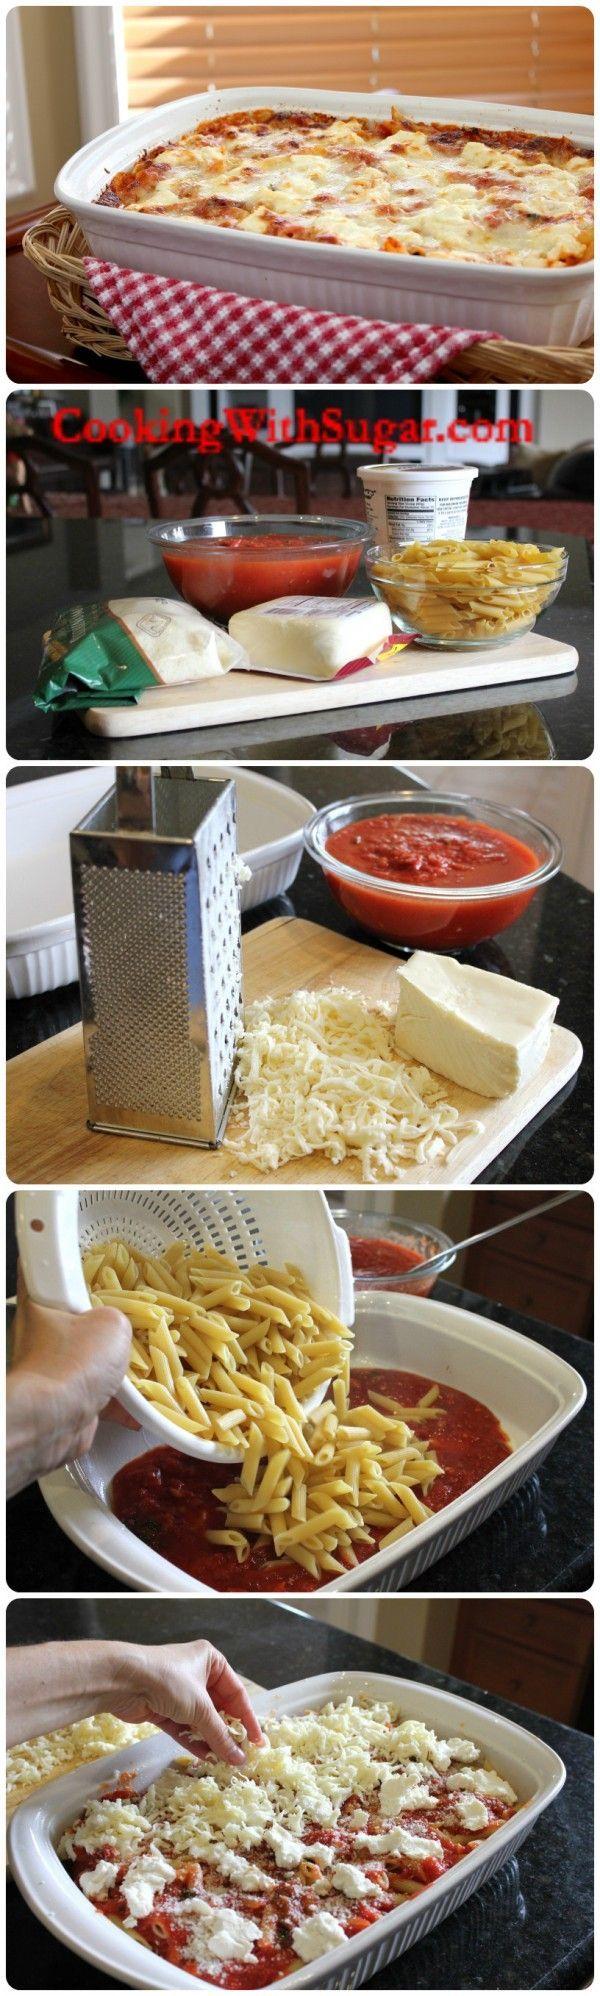 Homemade Italian Pasta Recipes – Baked Ziti, Great Dinner Recipe everyone Will Love!